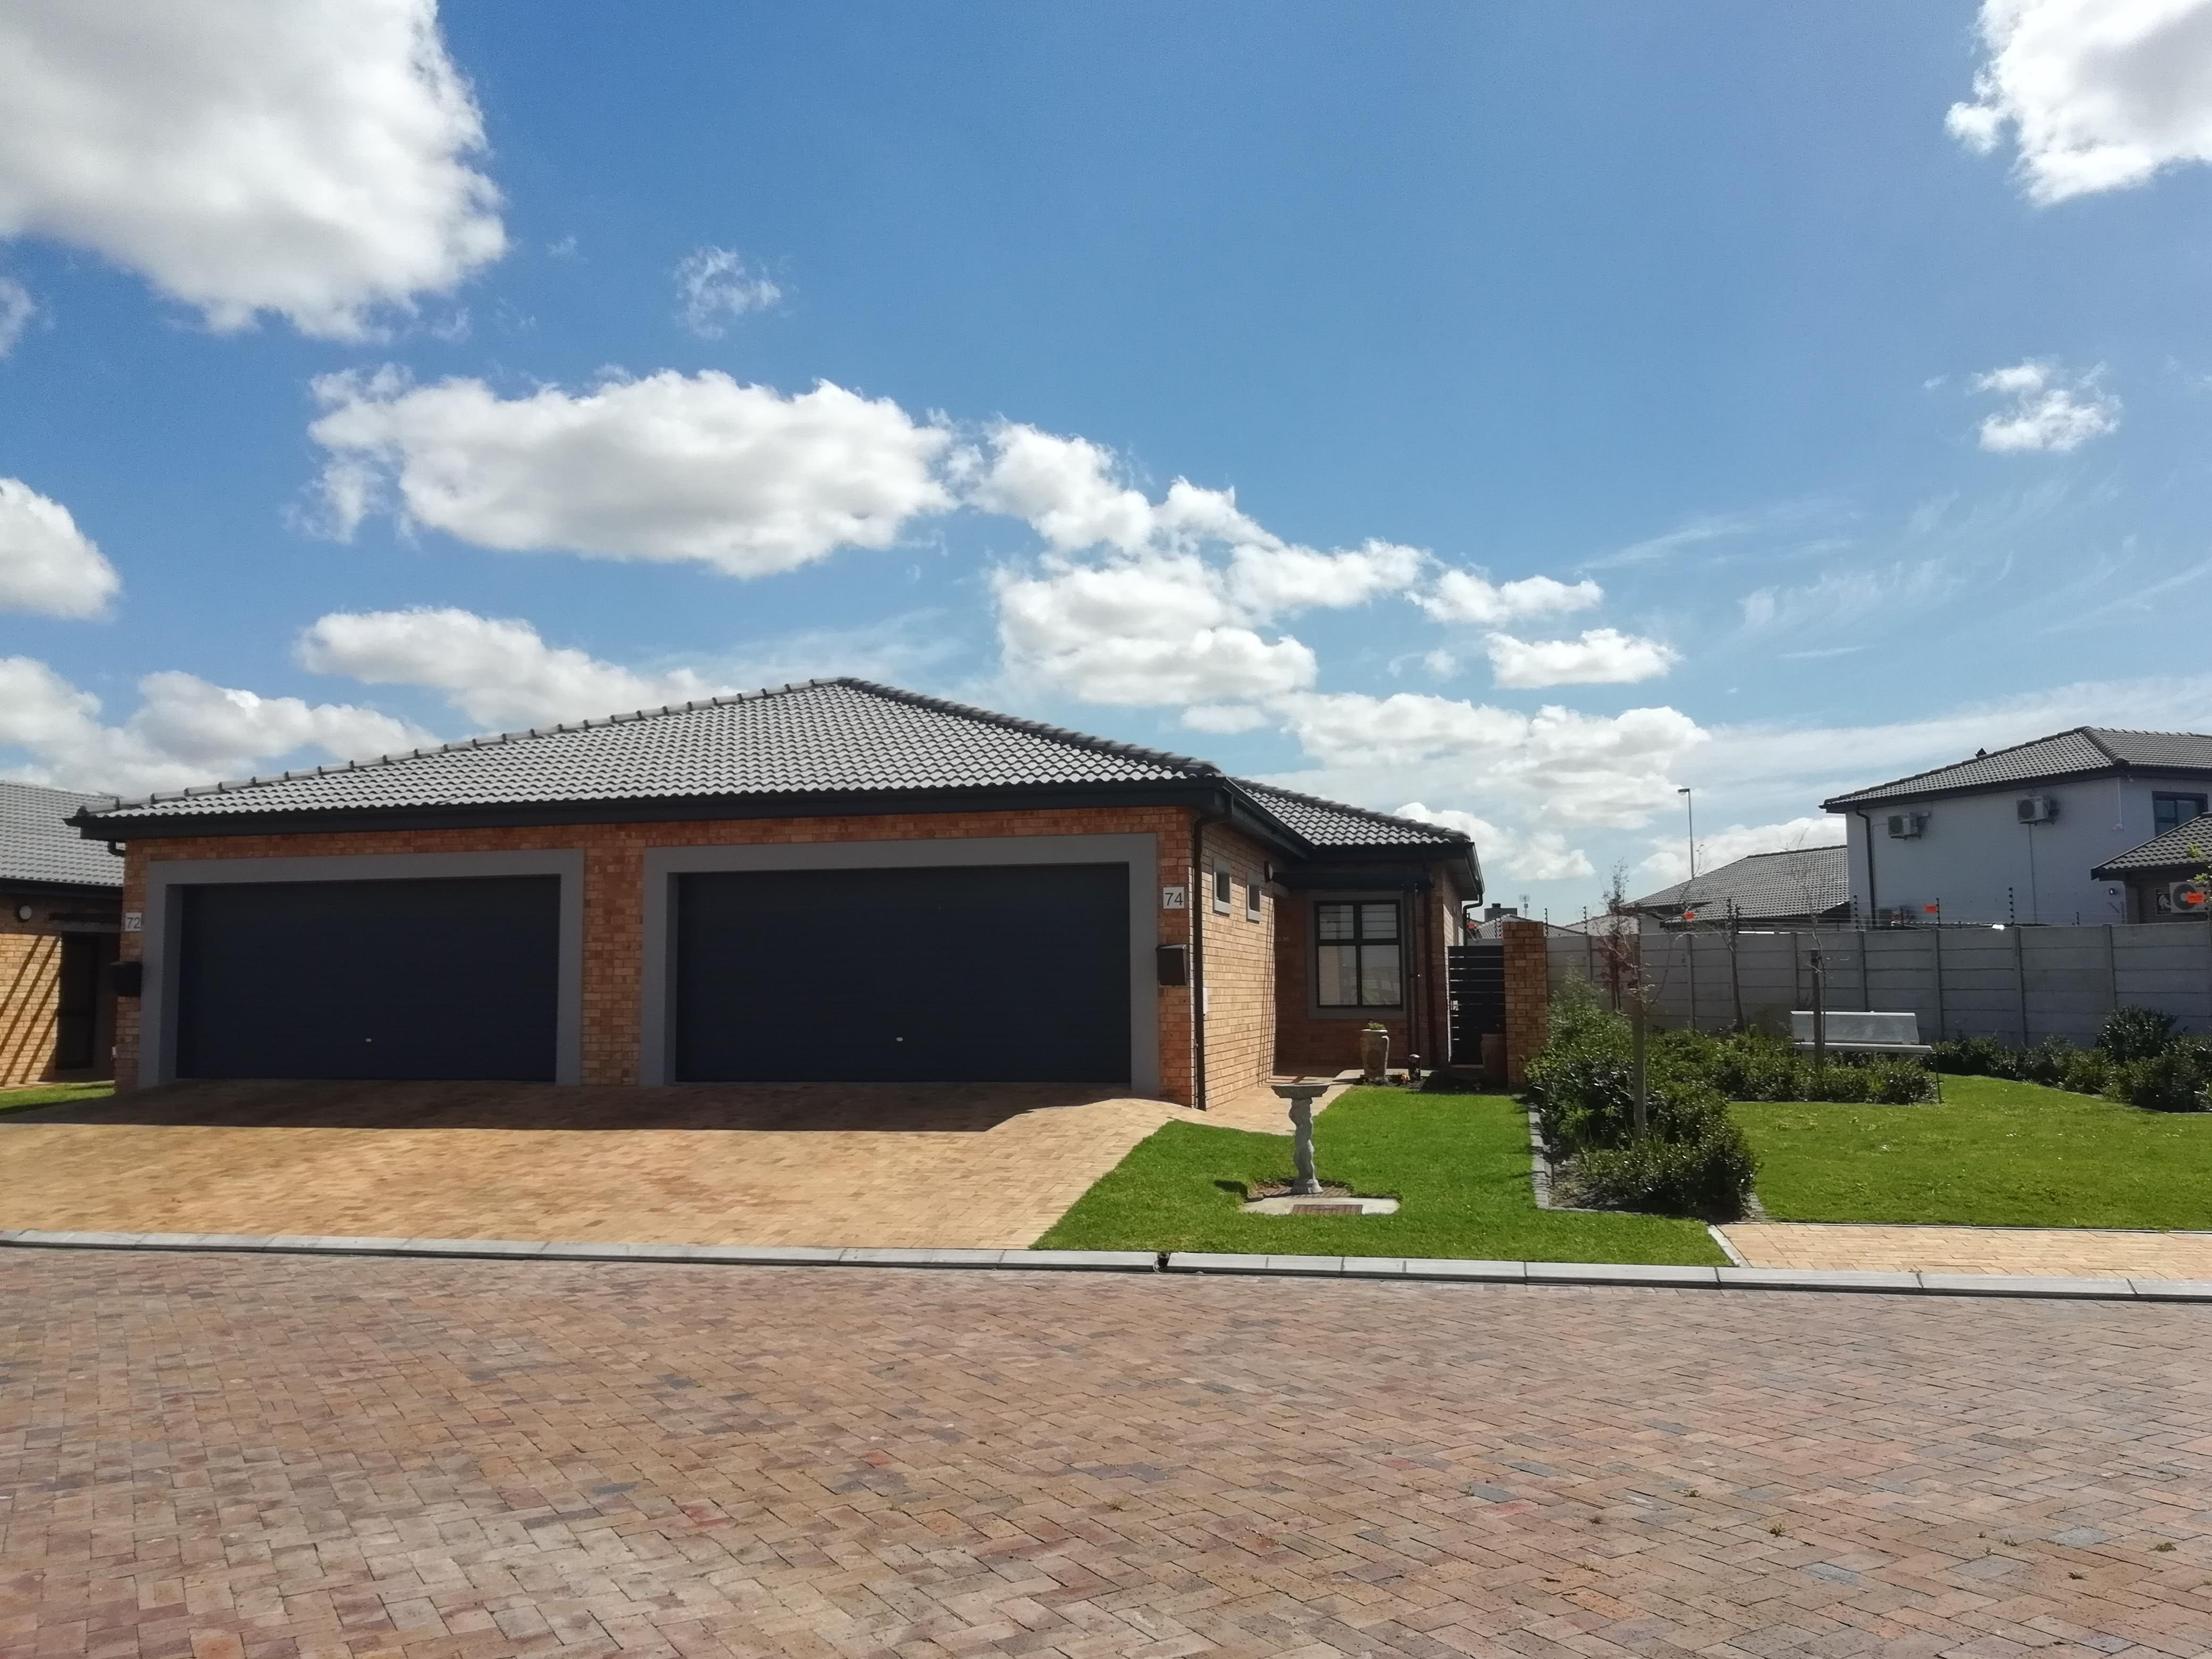 Kwali Mark Construction CC, Park Lane Estate, Brackenfell, Western Cape